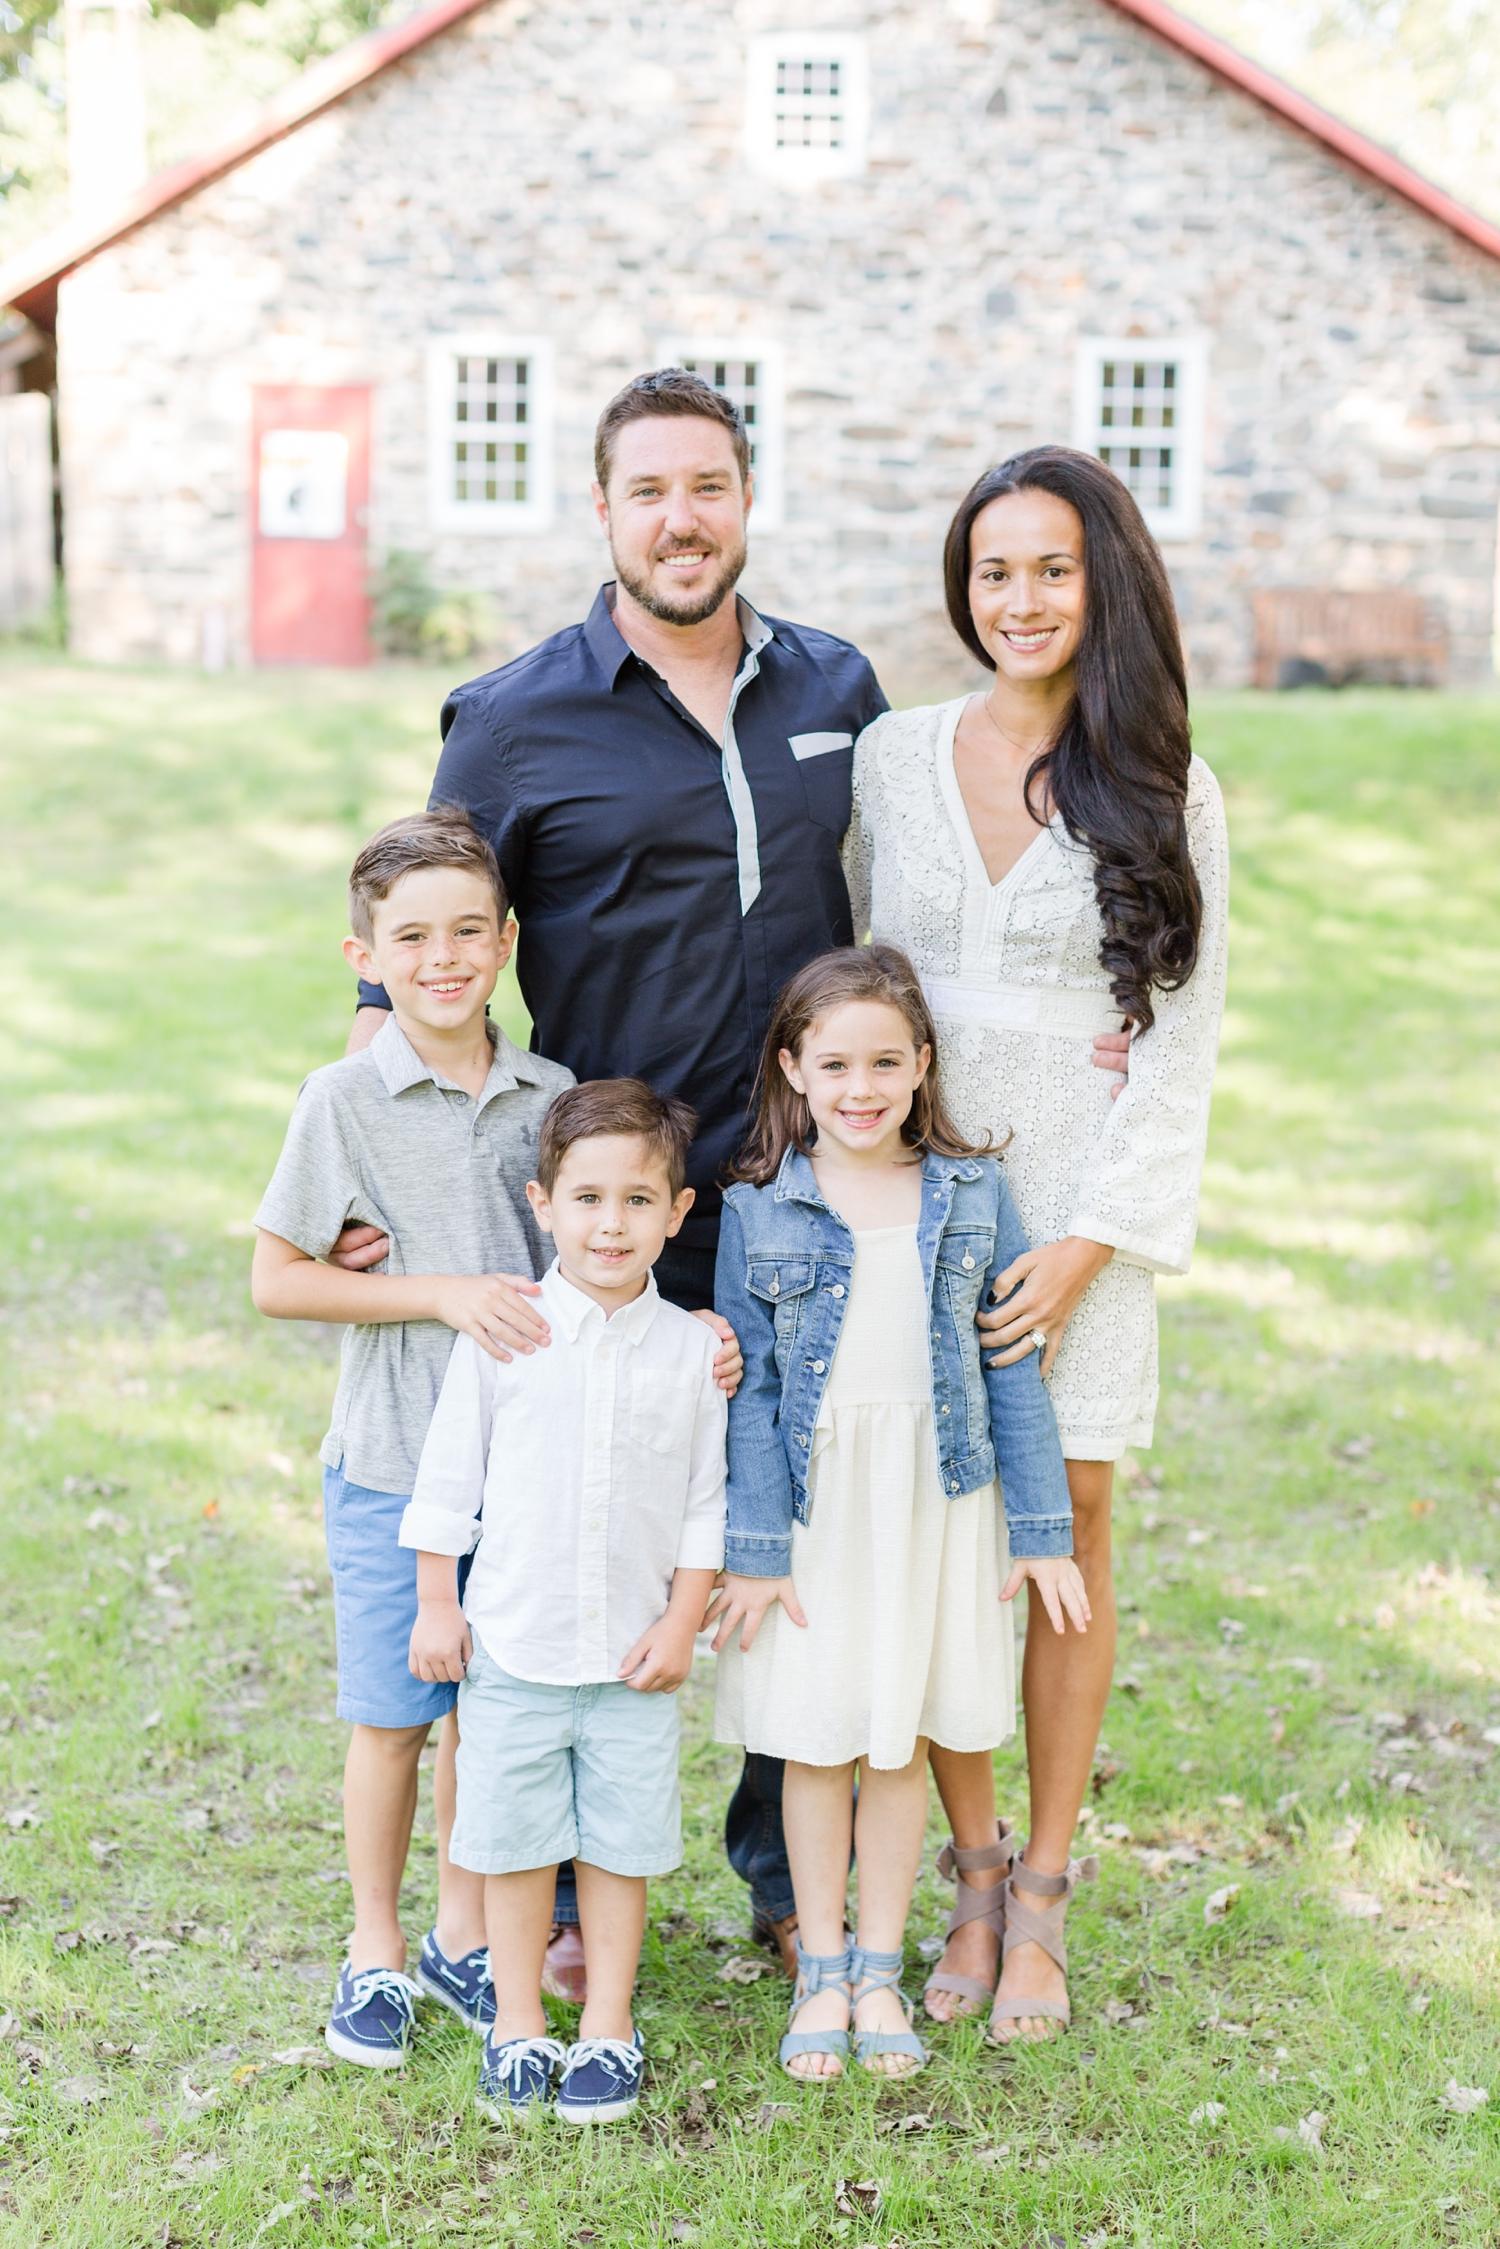 Smith-Padgett Family 2018-11_Jerusalem-Mill-Maryland-Family-Photographer-anna-grace-photography-photo.jpg